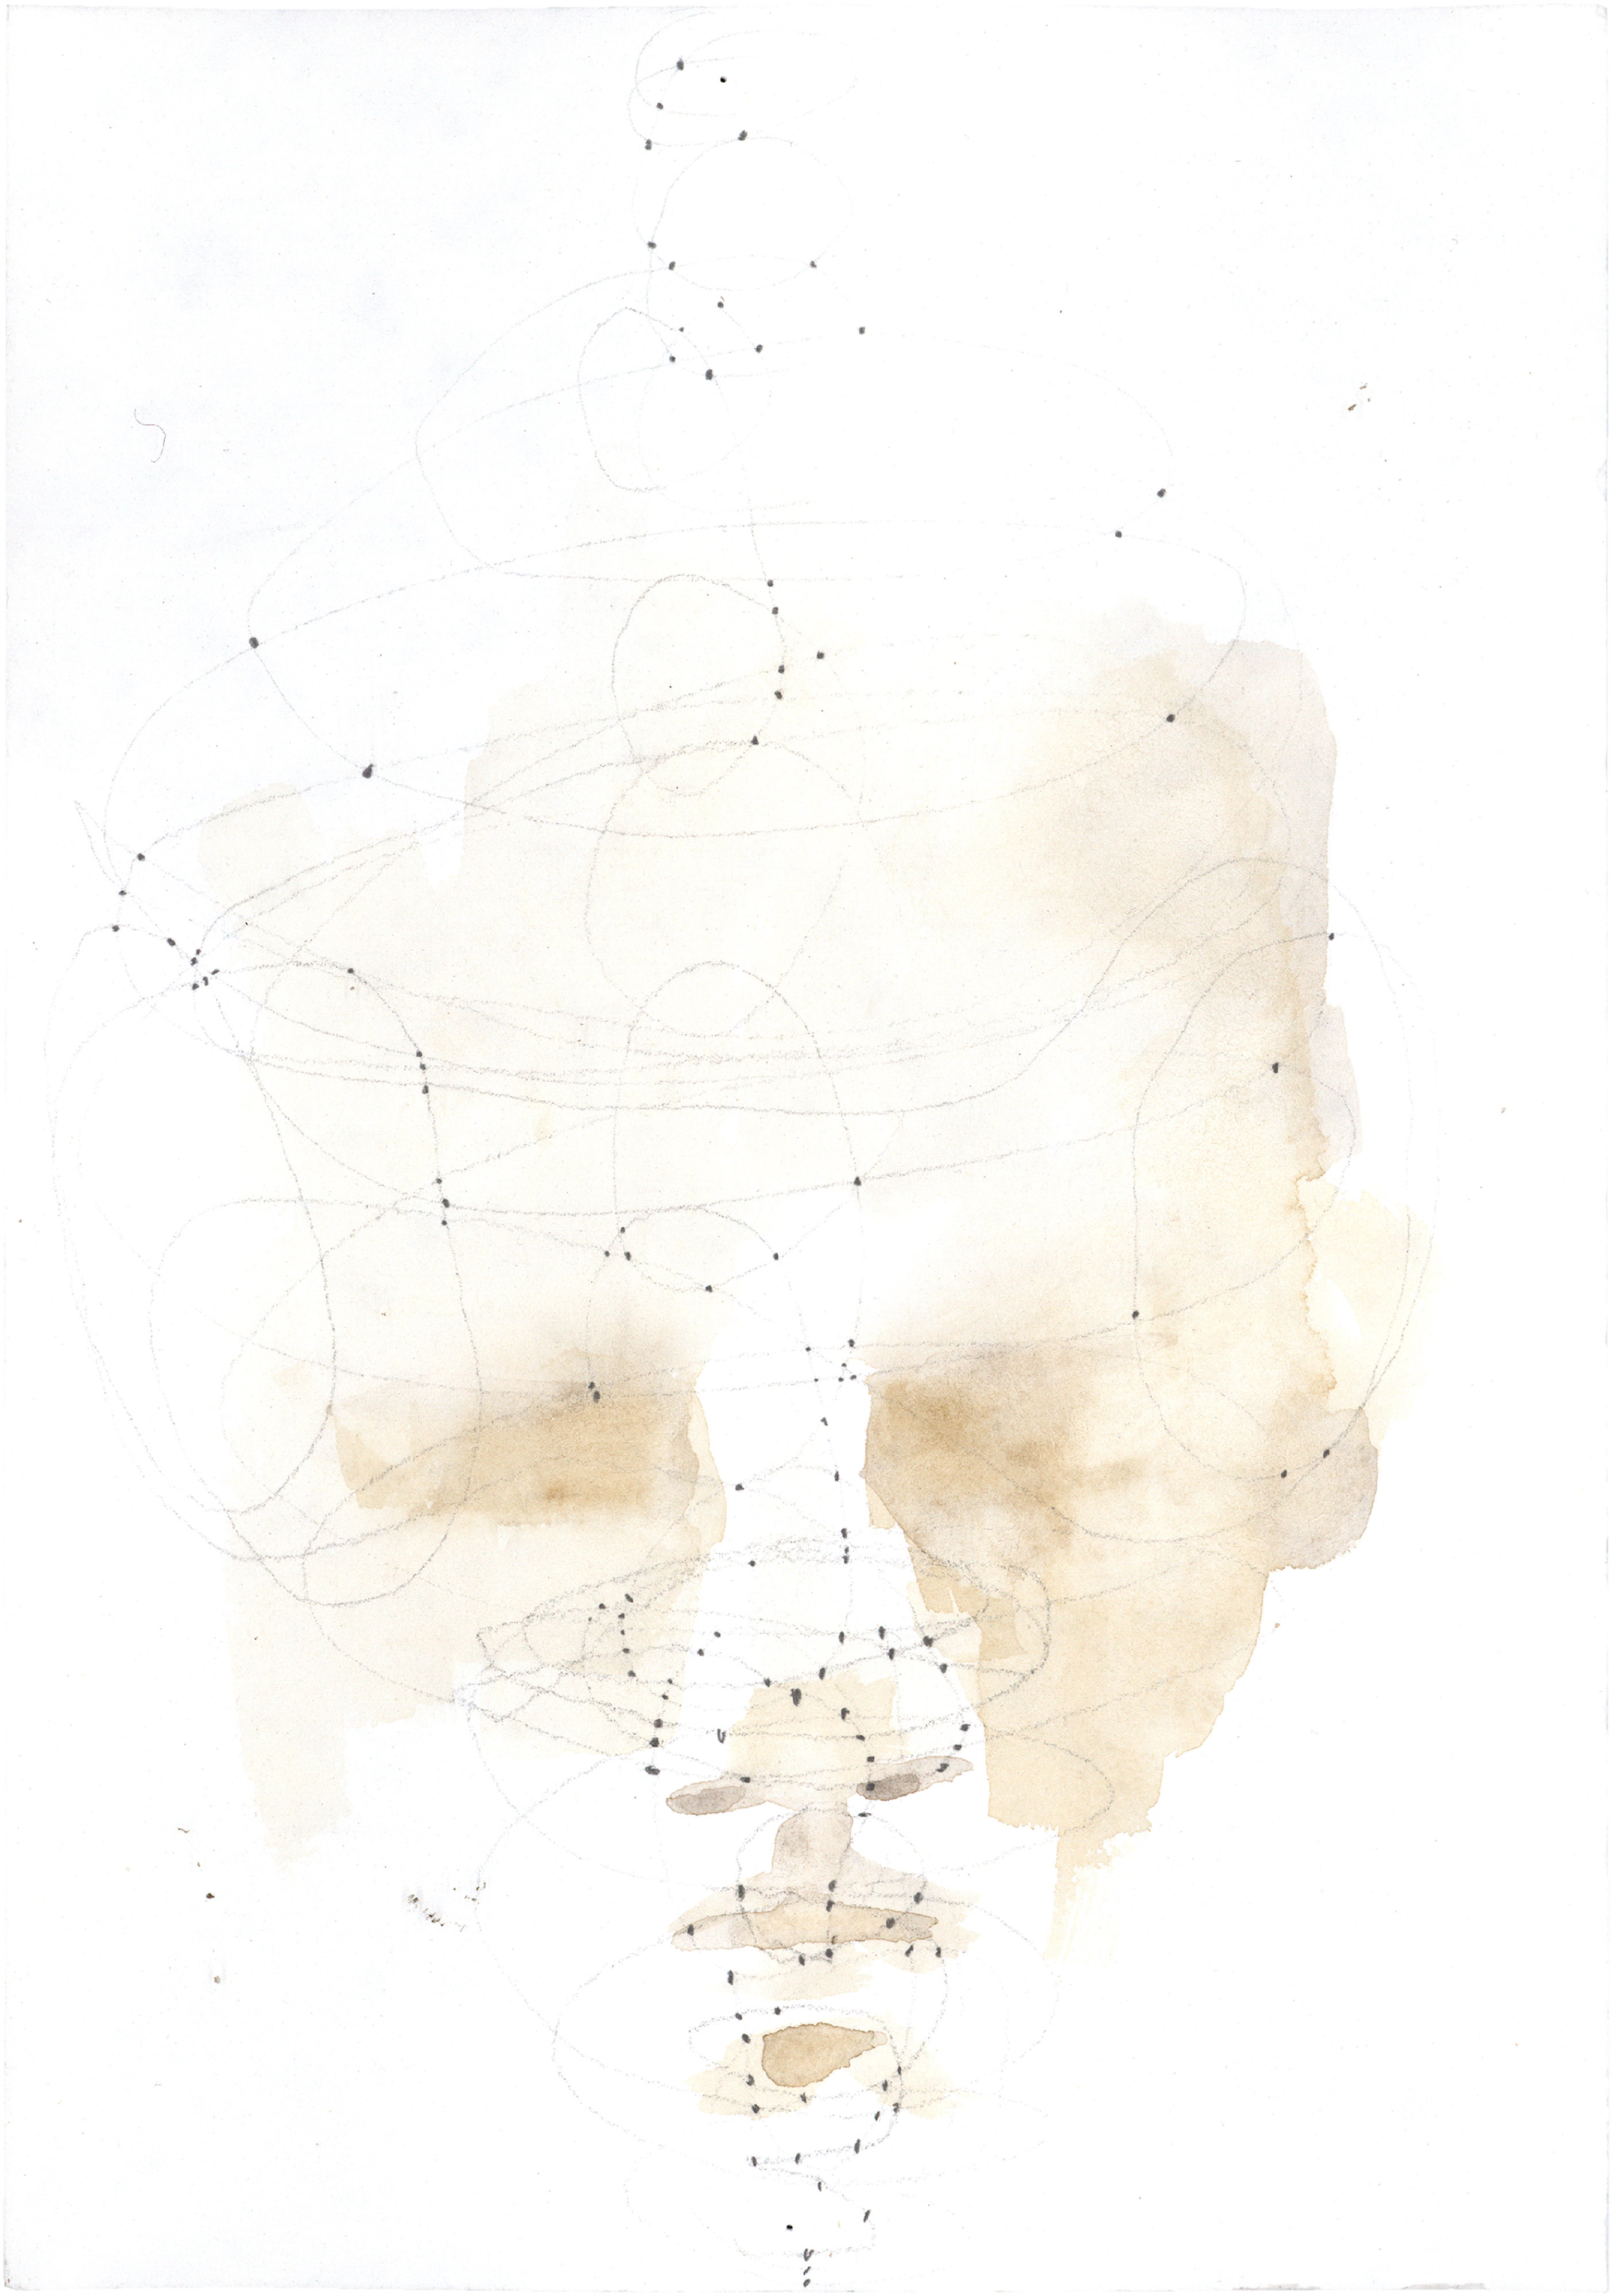 Galerie Barbara Thumm \ New Viewings #2 \ New Viewings #2